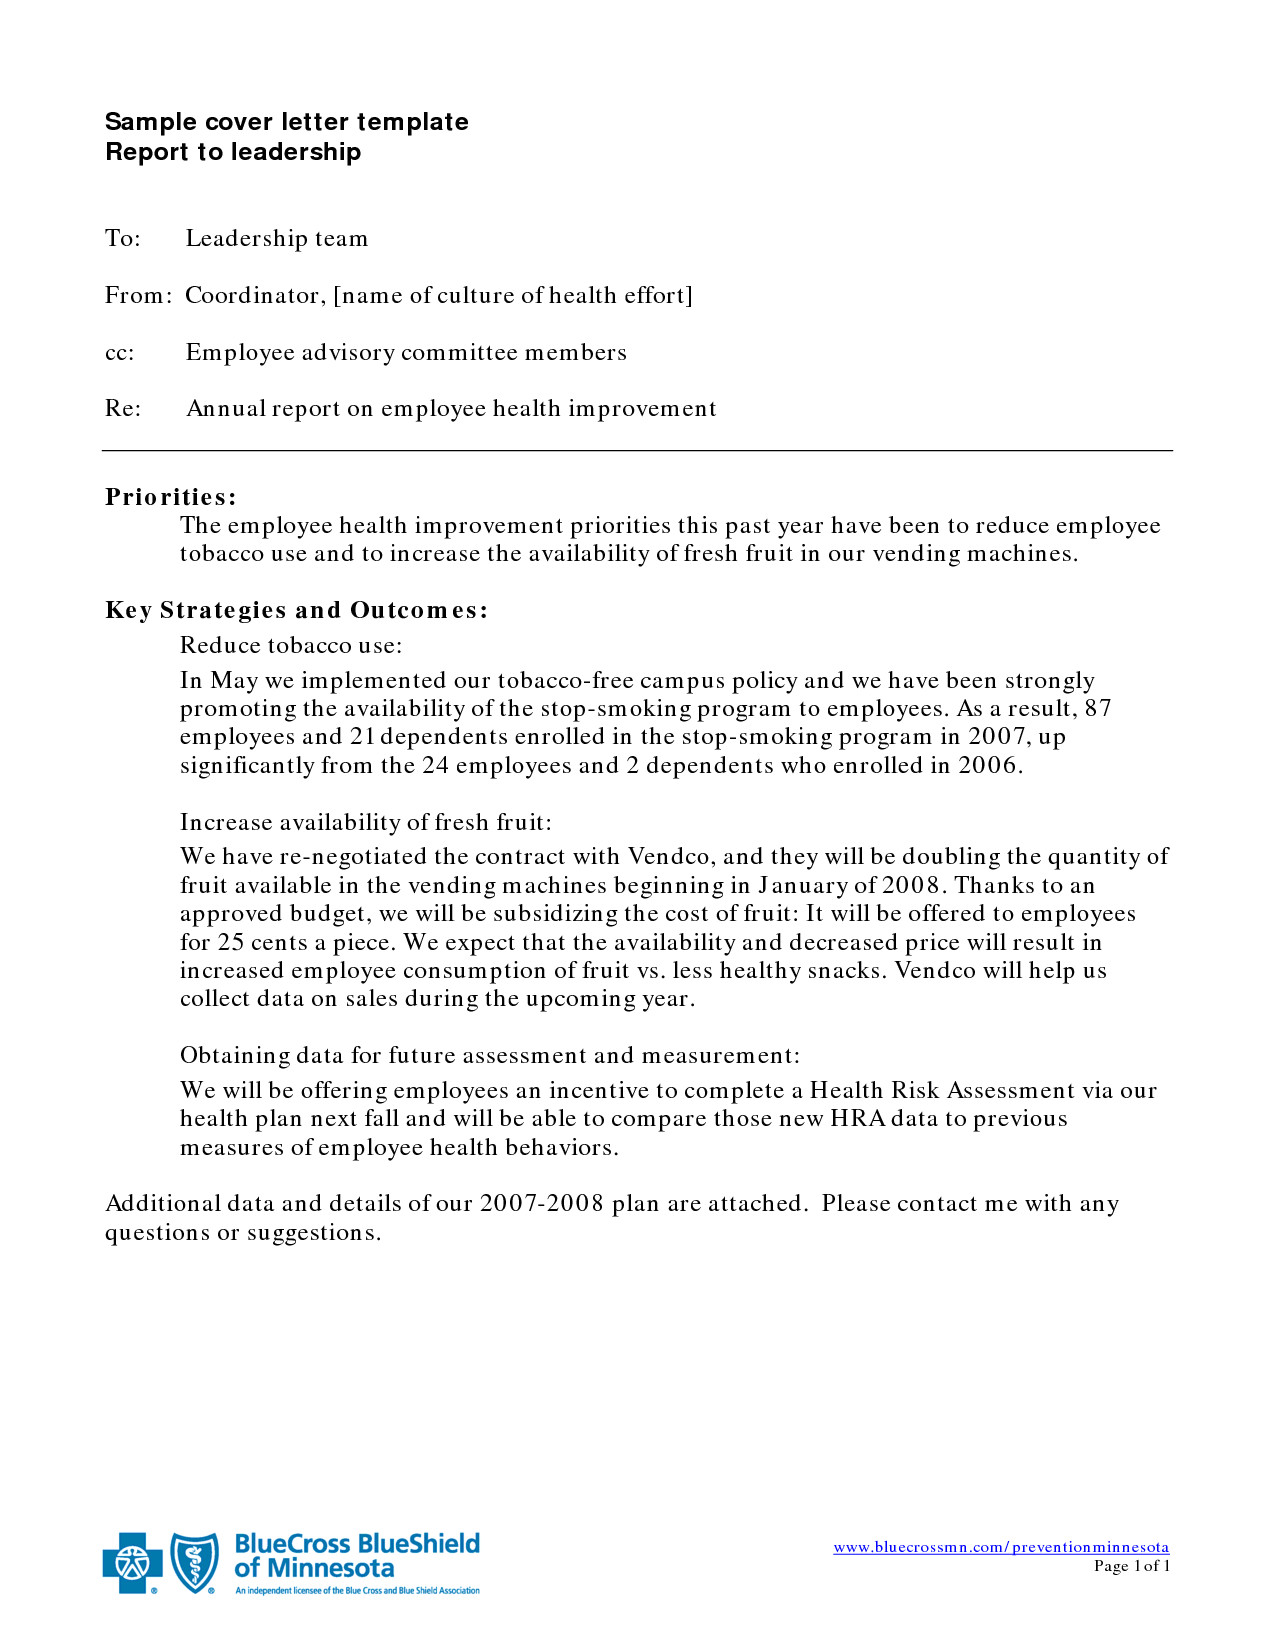 post leadership letter template 373690